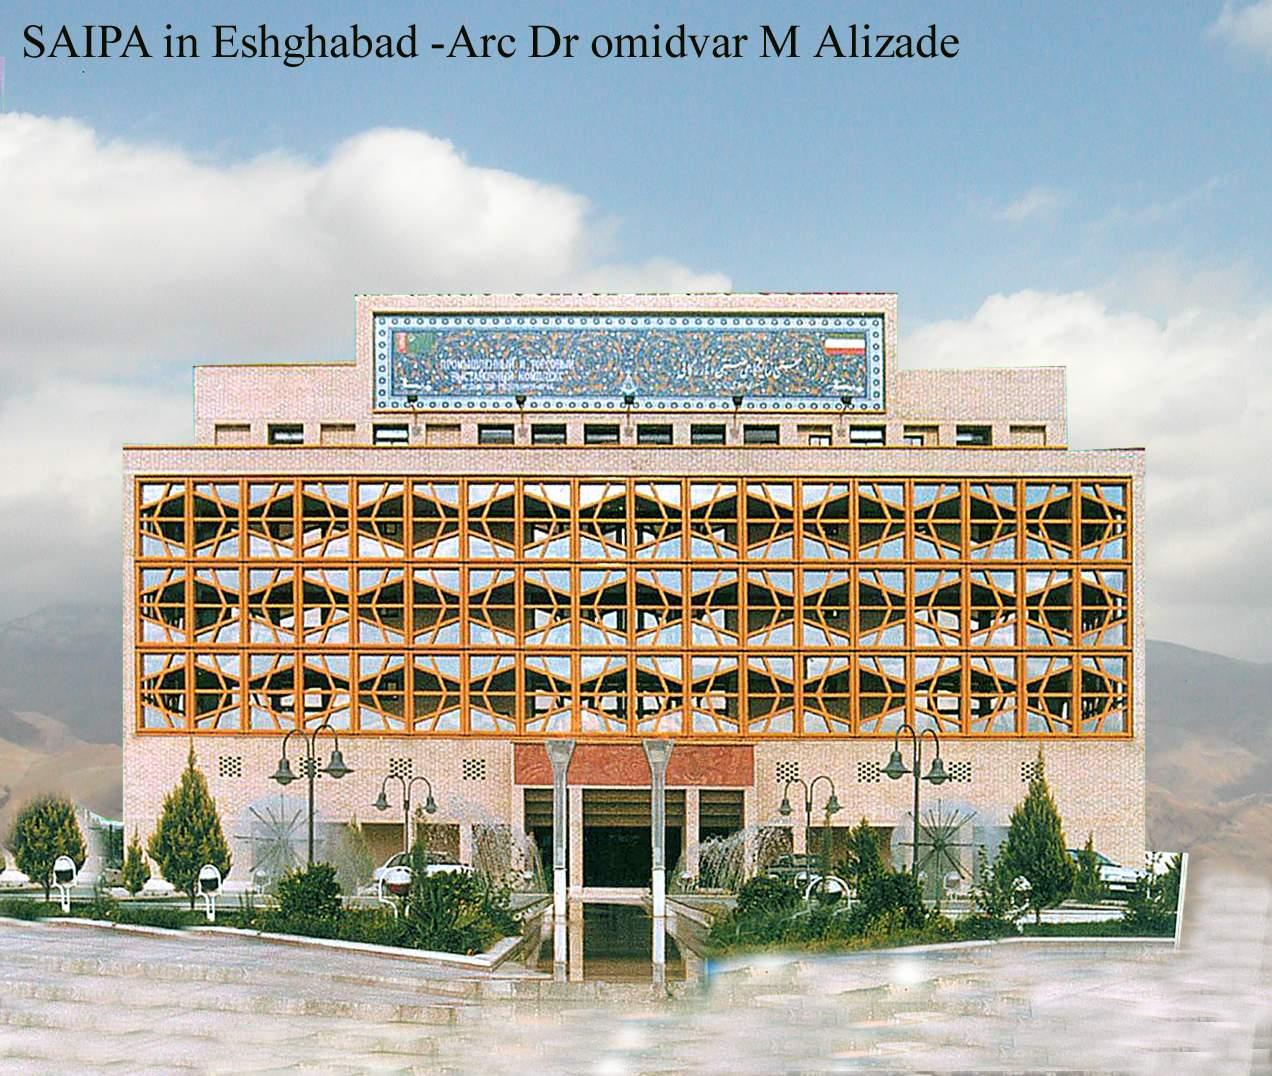 SAIPA-in-eshghabad (2)